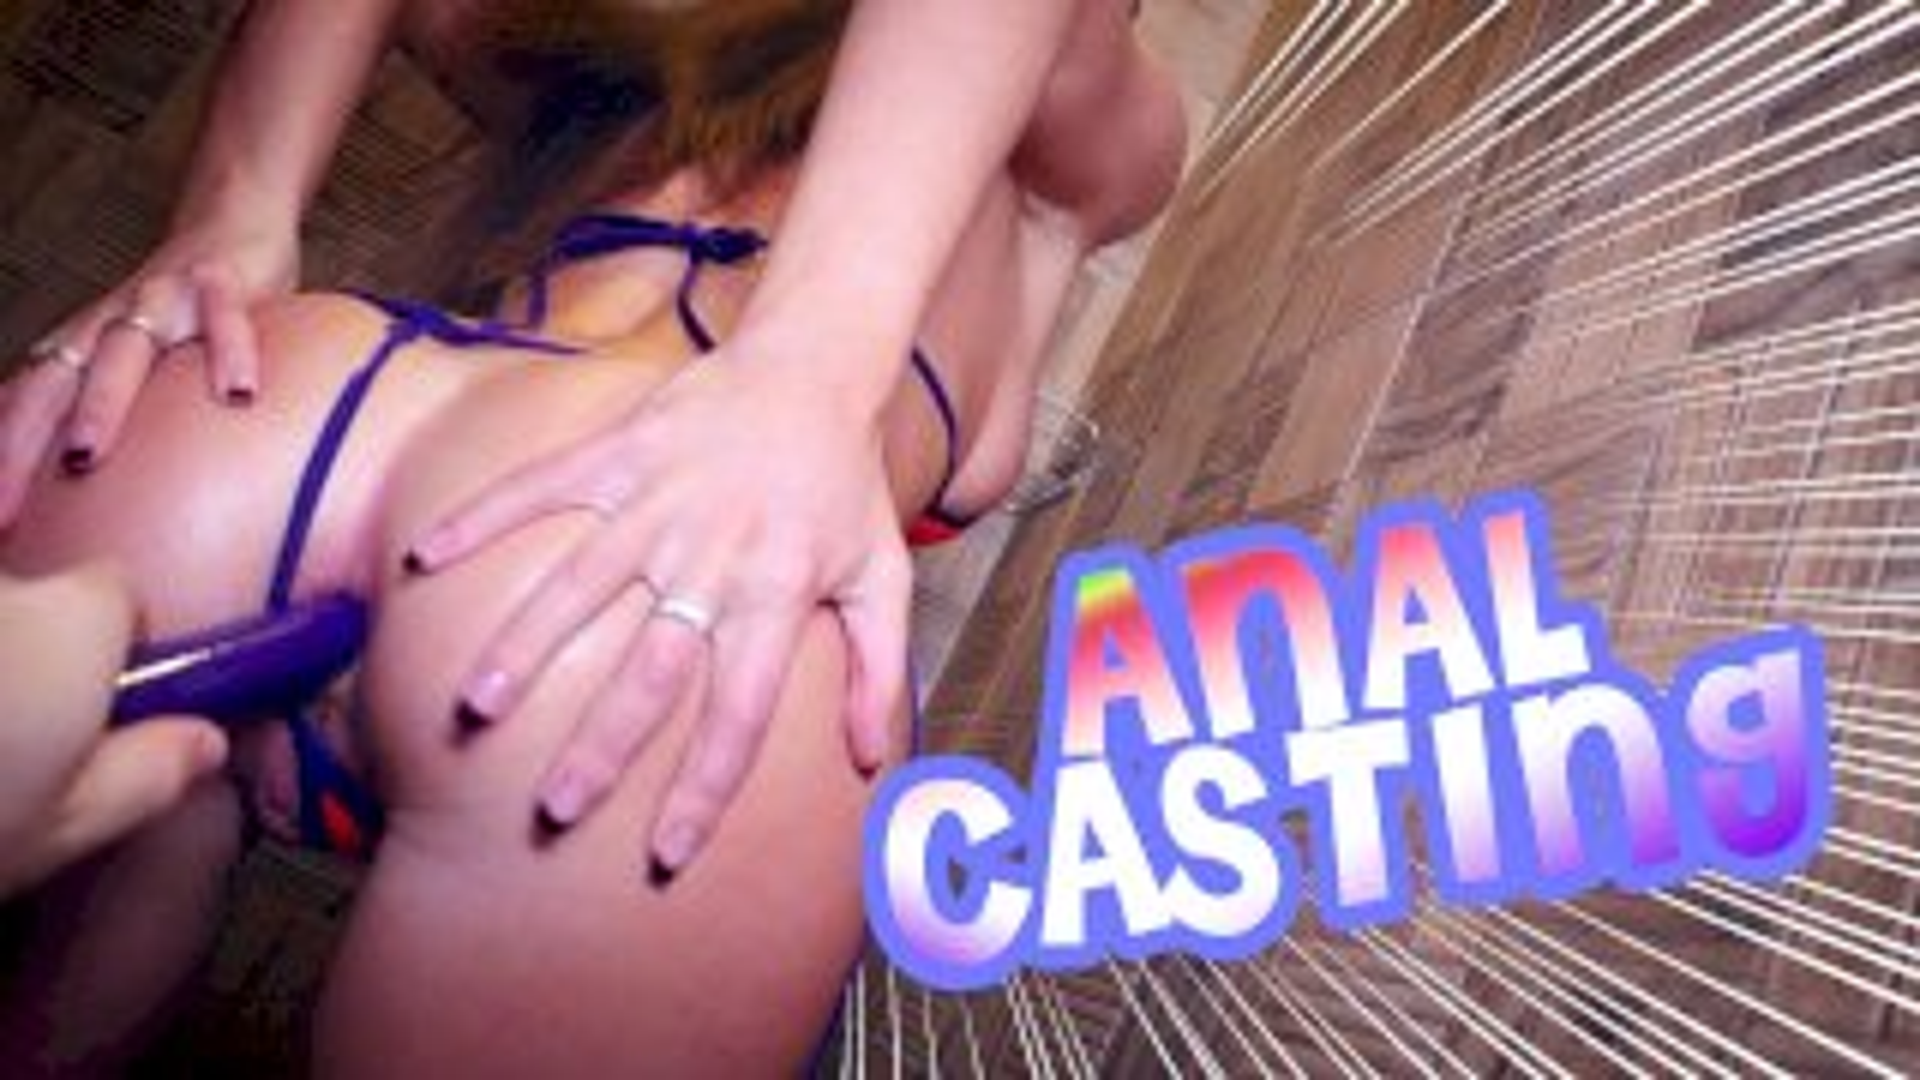 Anal Casting with Lita Phoenix - SWEETYX